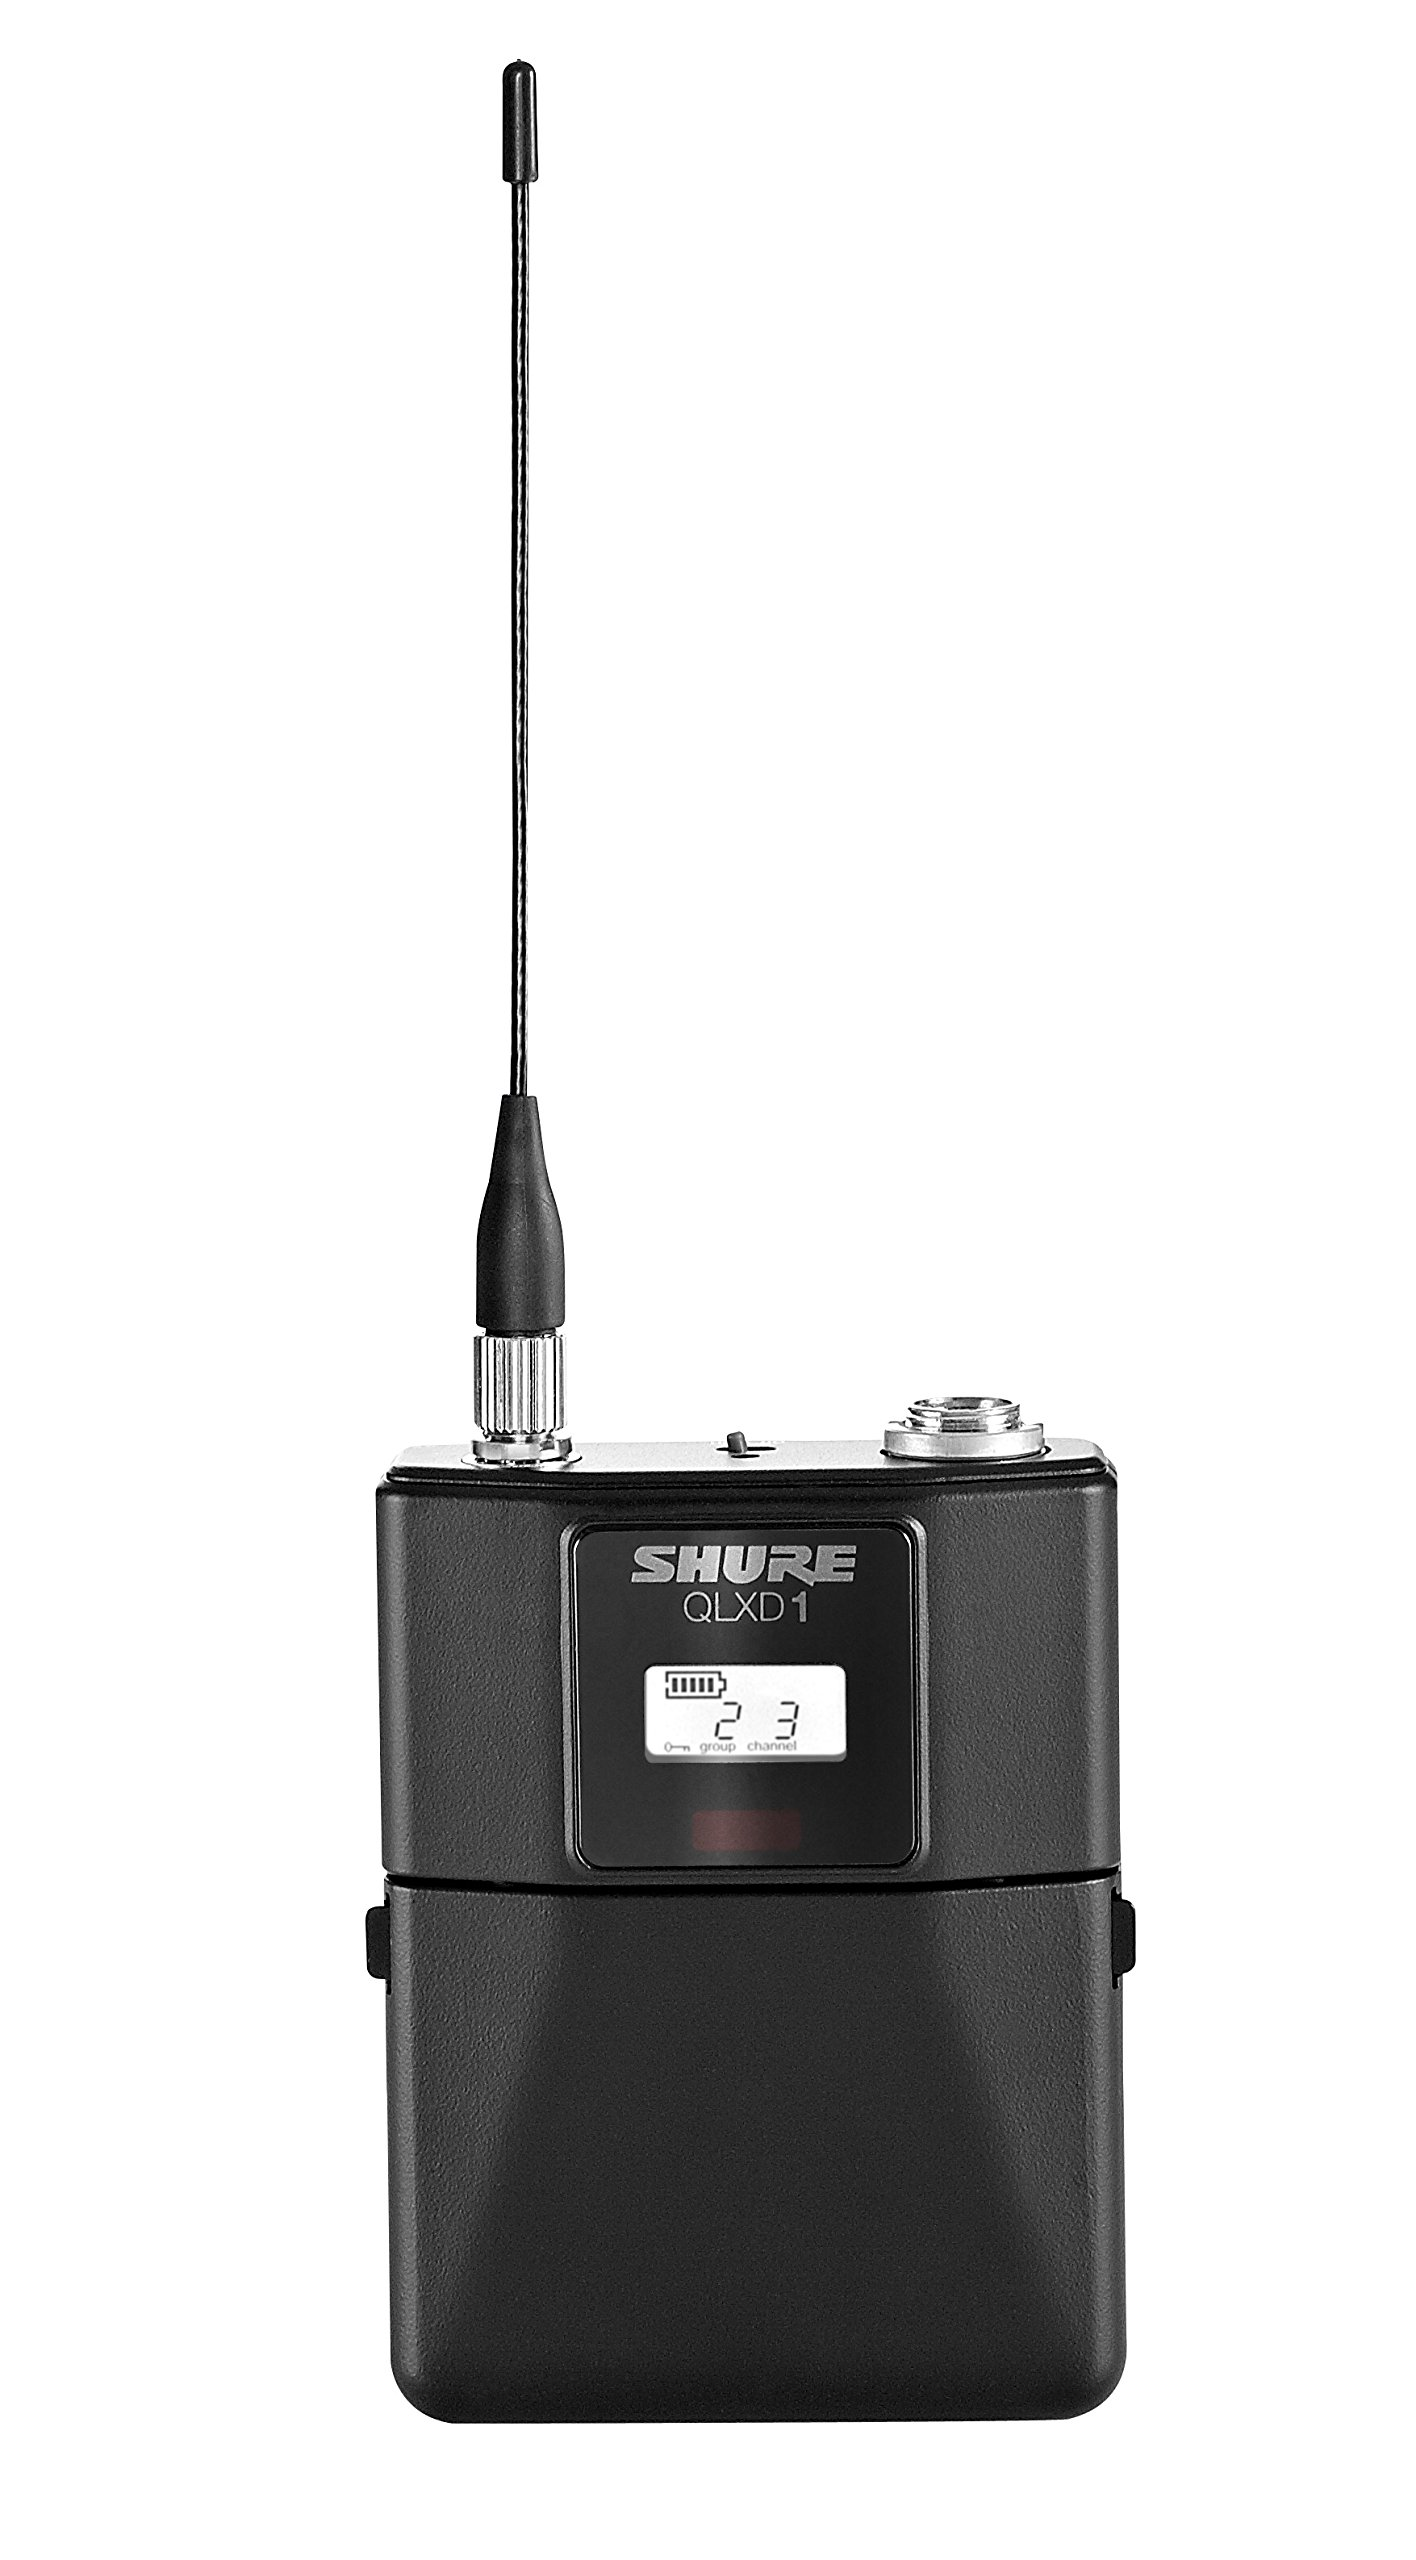 Shure QLXD1 Wireless Bodypack Transmitter, H50 by Shure